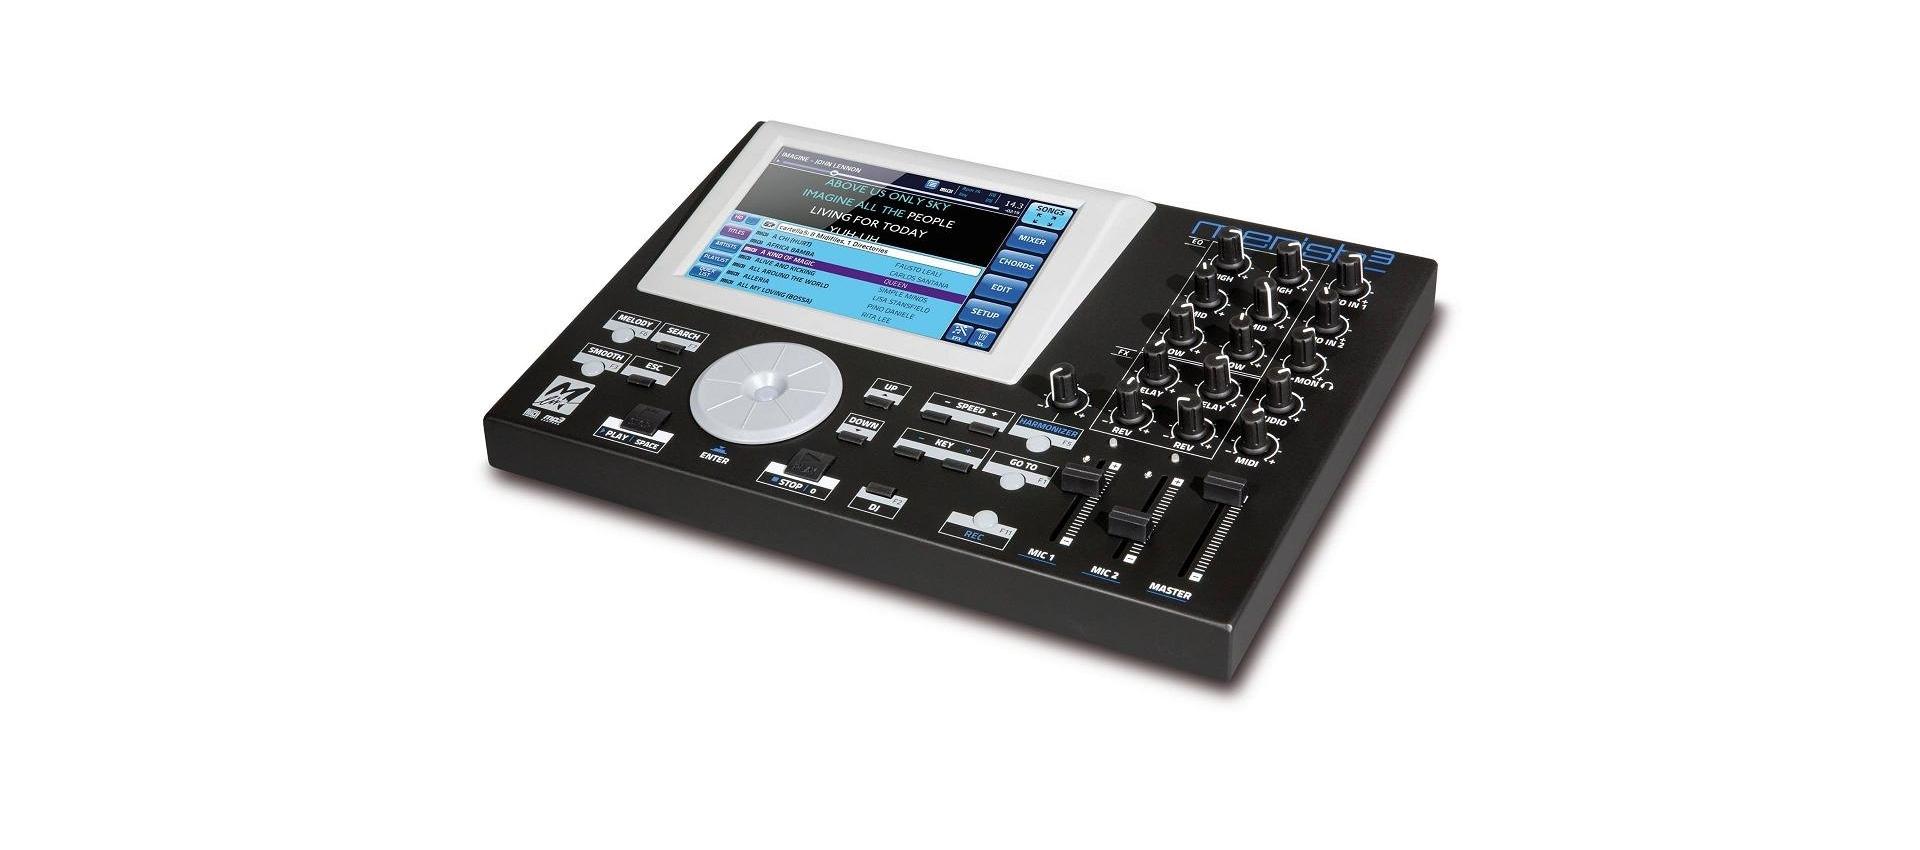 M-LIVE MERISH 3 MIDI MP3 PLAYER TOUCH SCREEN DISPLAY - LuckyMusic